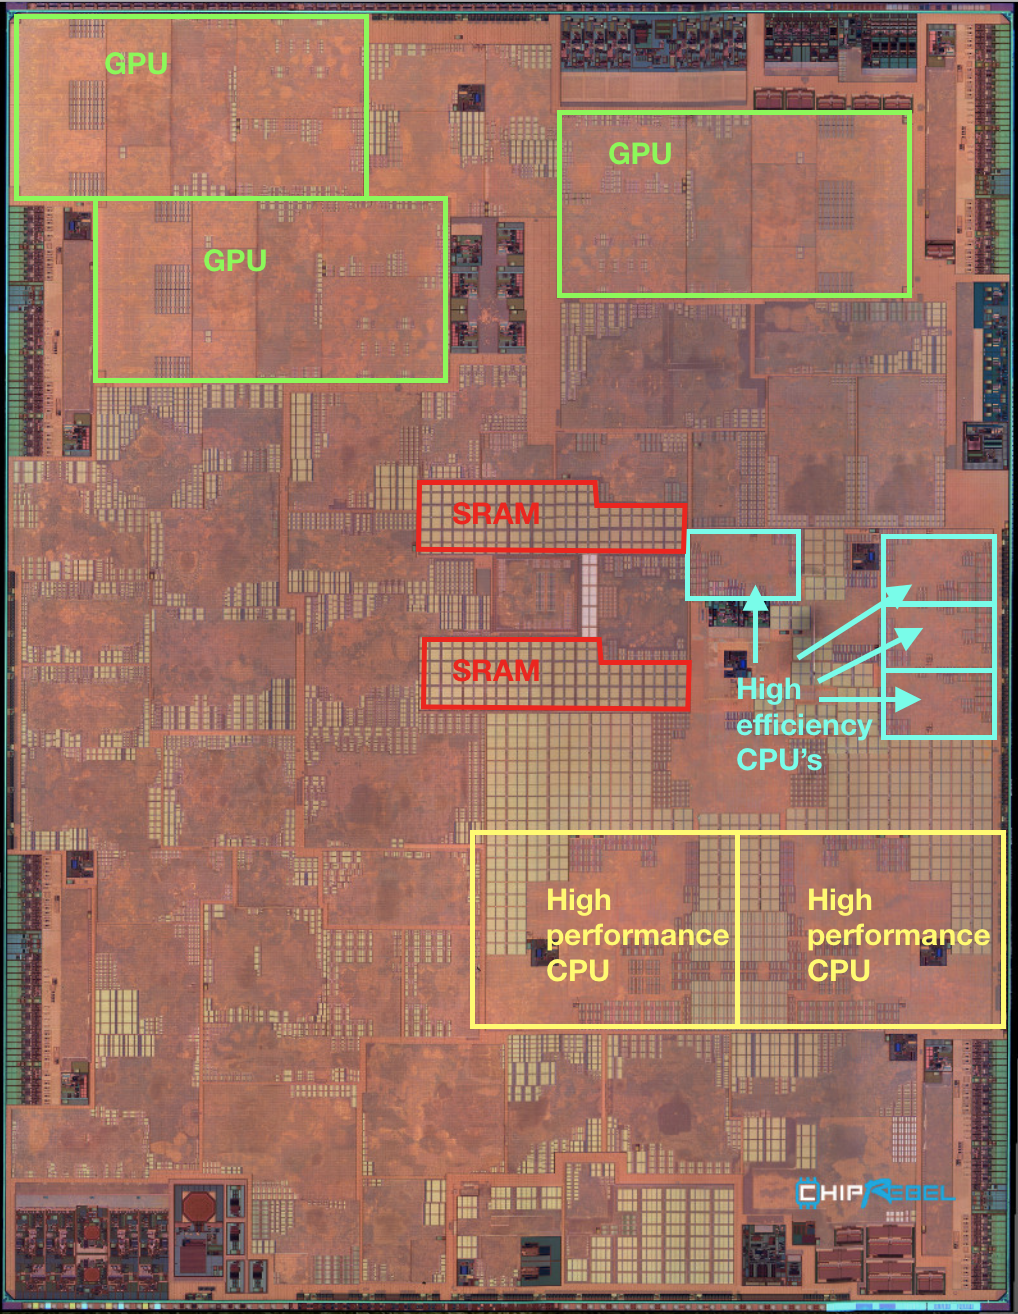 2017 Ram Rebel >> Apple A11 Bionic chip image TMHS09